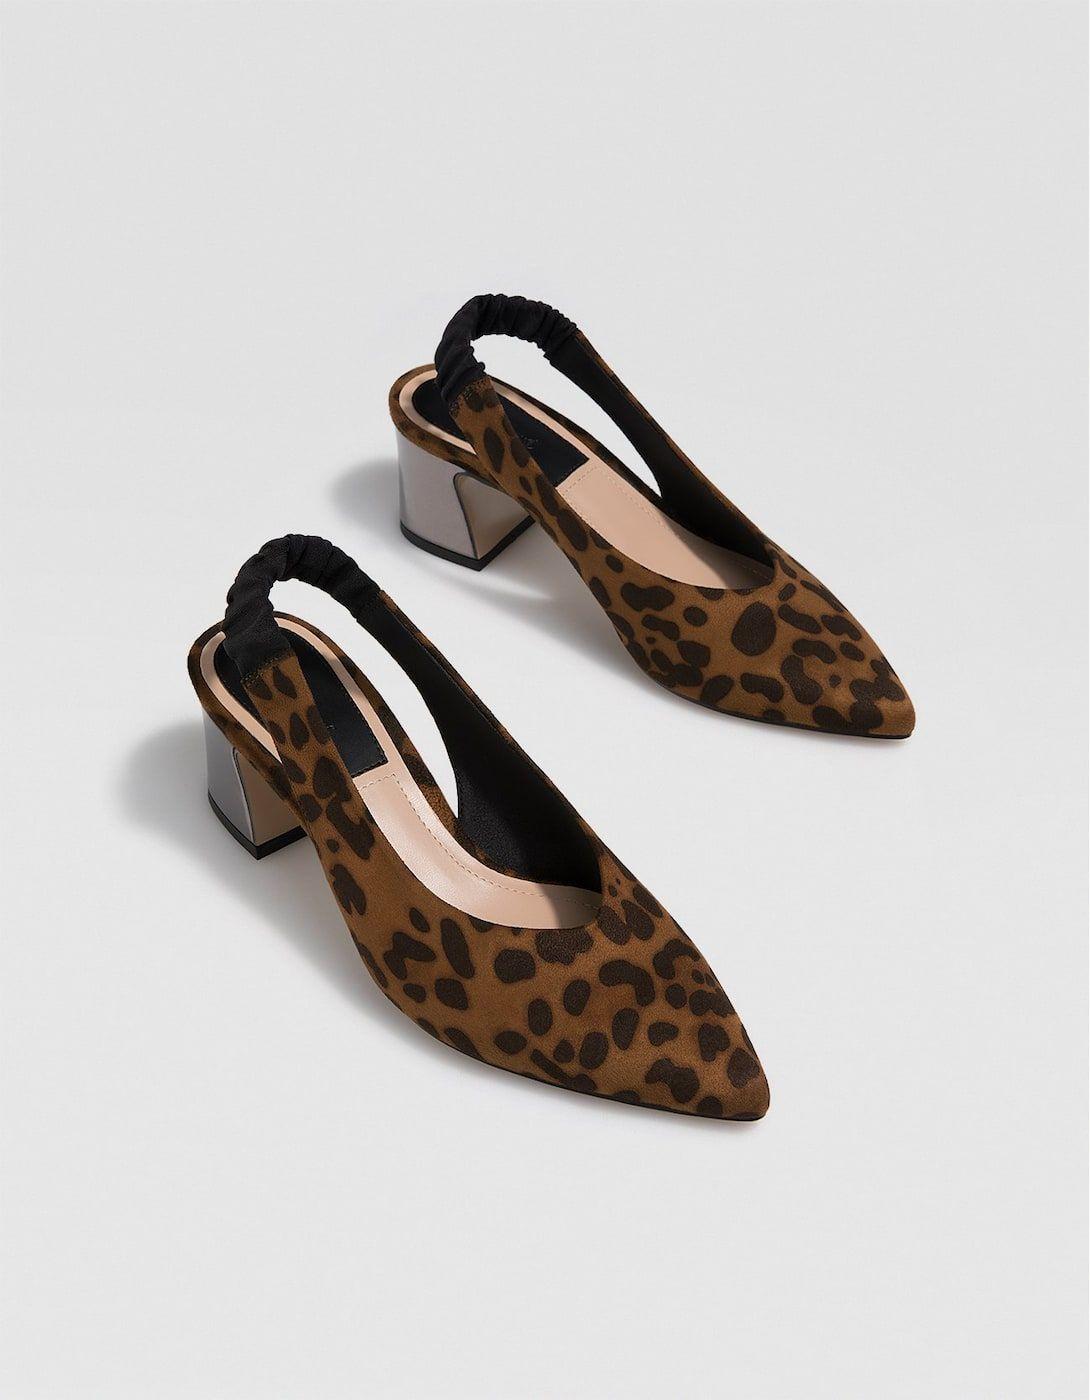 483b91c6b747f Animal print slingback mid-heel court shoes - All | Stradivarius United  Kingdom